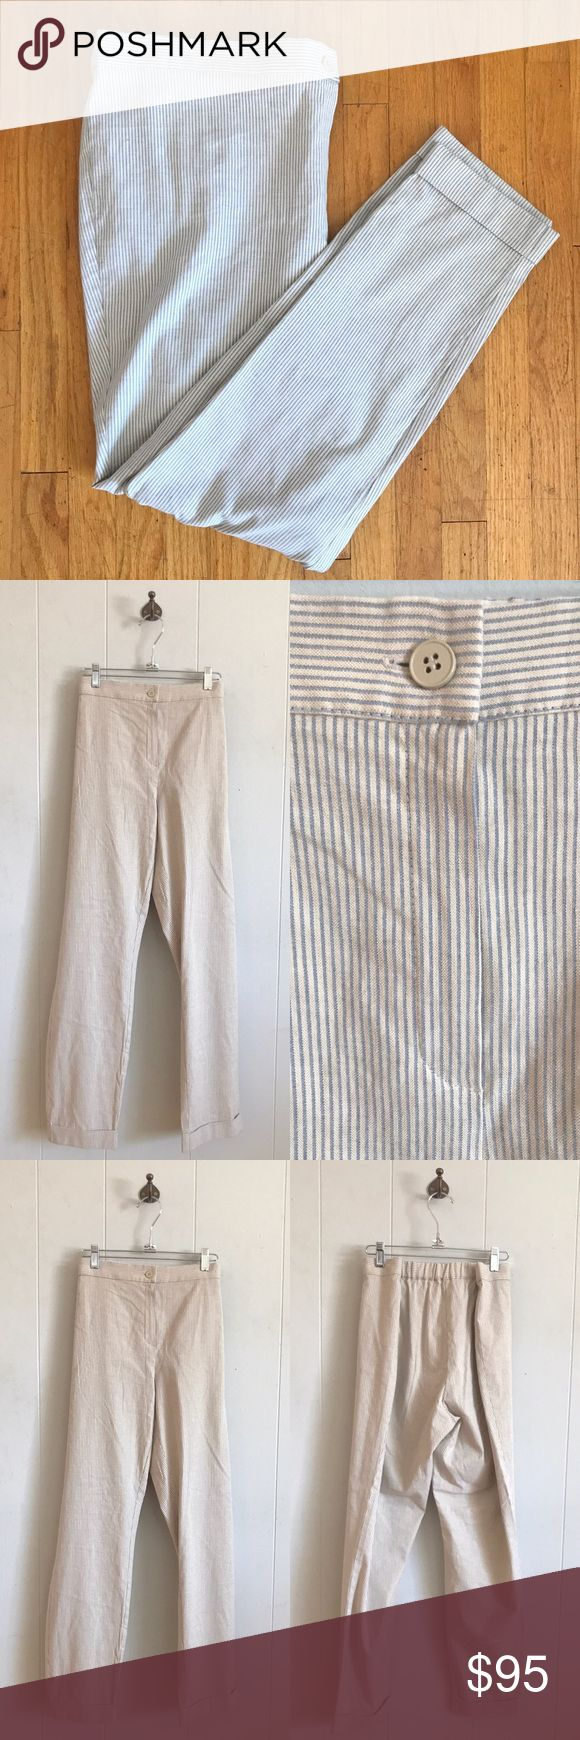 "NWT Marina Rinaldi Striped Pants NWT Marina Rinaldi Striped Pants. Size 27, which is a women's size 18 (see size chart in last image). 72% cotton, 25% flax, 3% elastane. Blue and cream stripes. Cuffed at bottom. Elastic on back of waistband. Waistband is 19.5"" across laying flat. Inseam is 30"". Marina Rinaldi Pants"